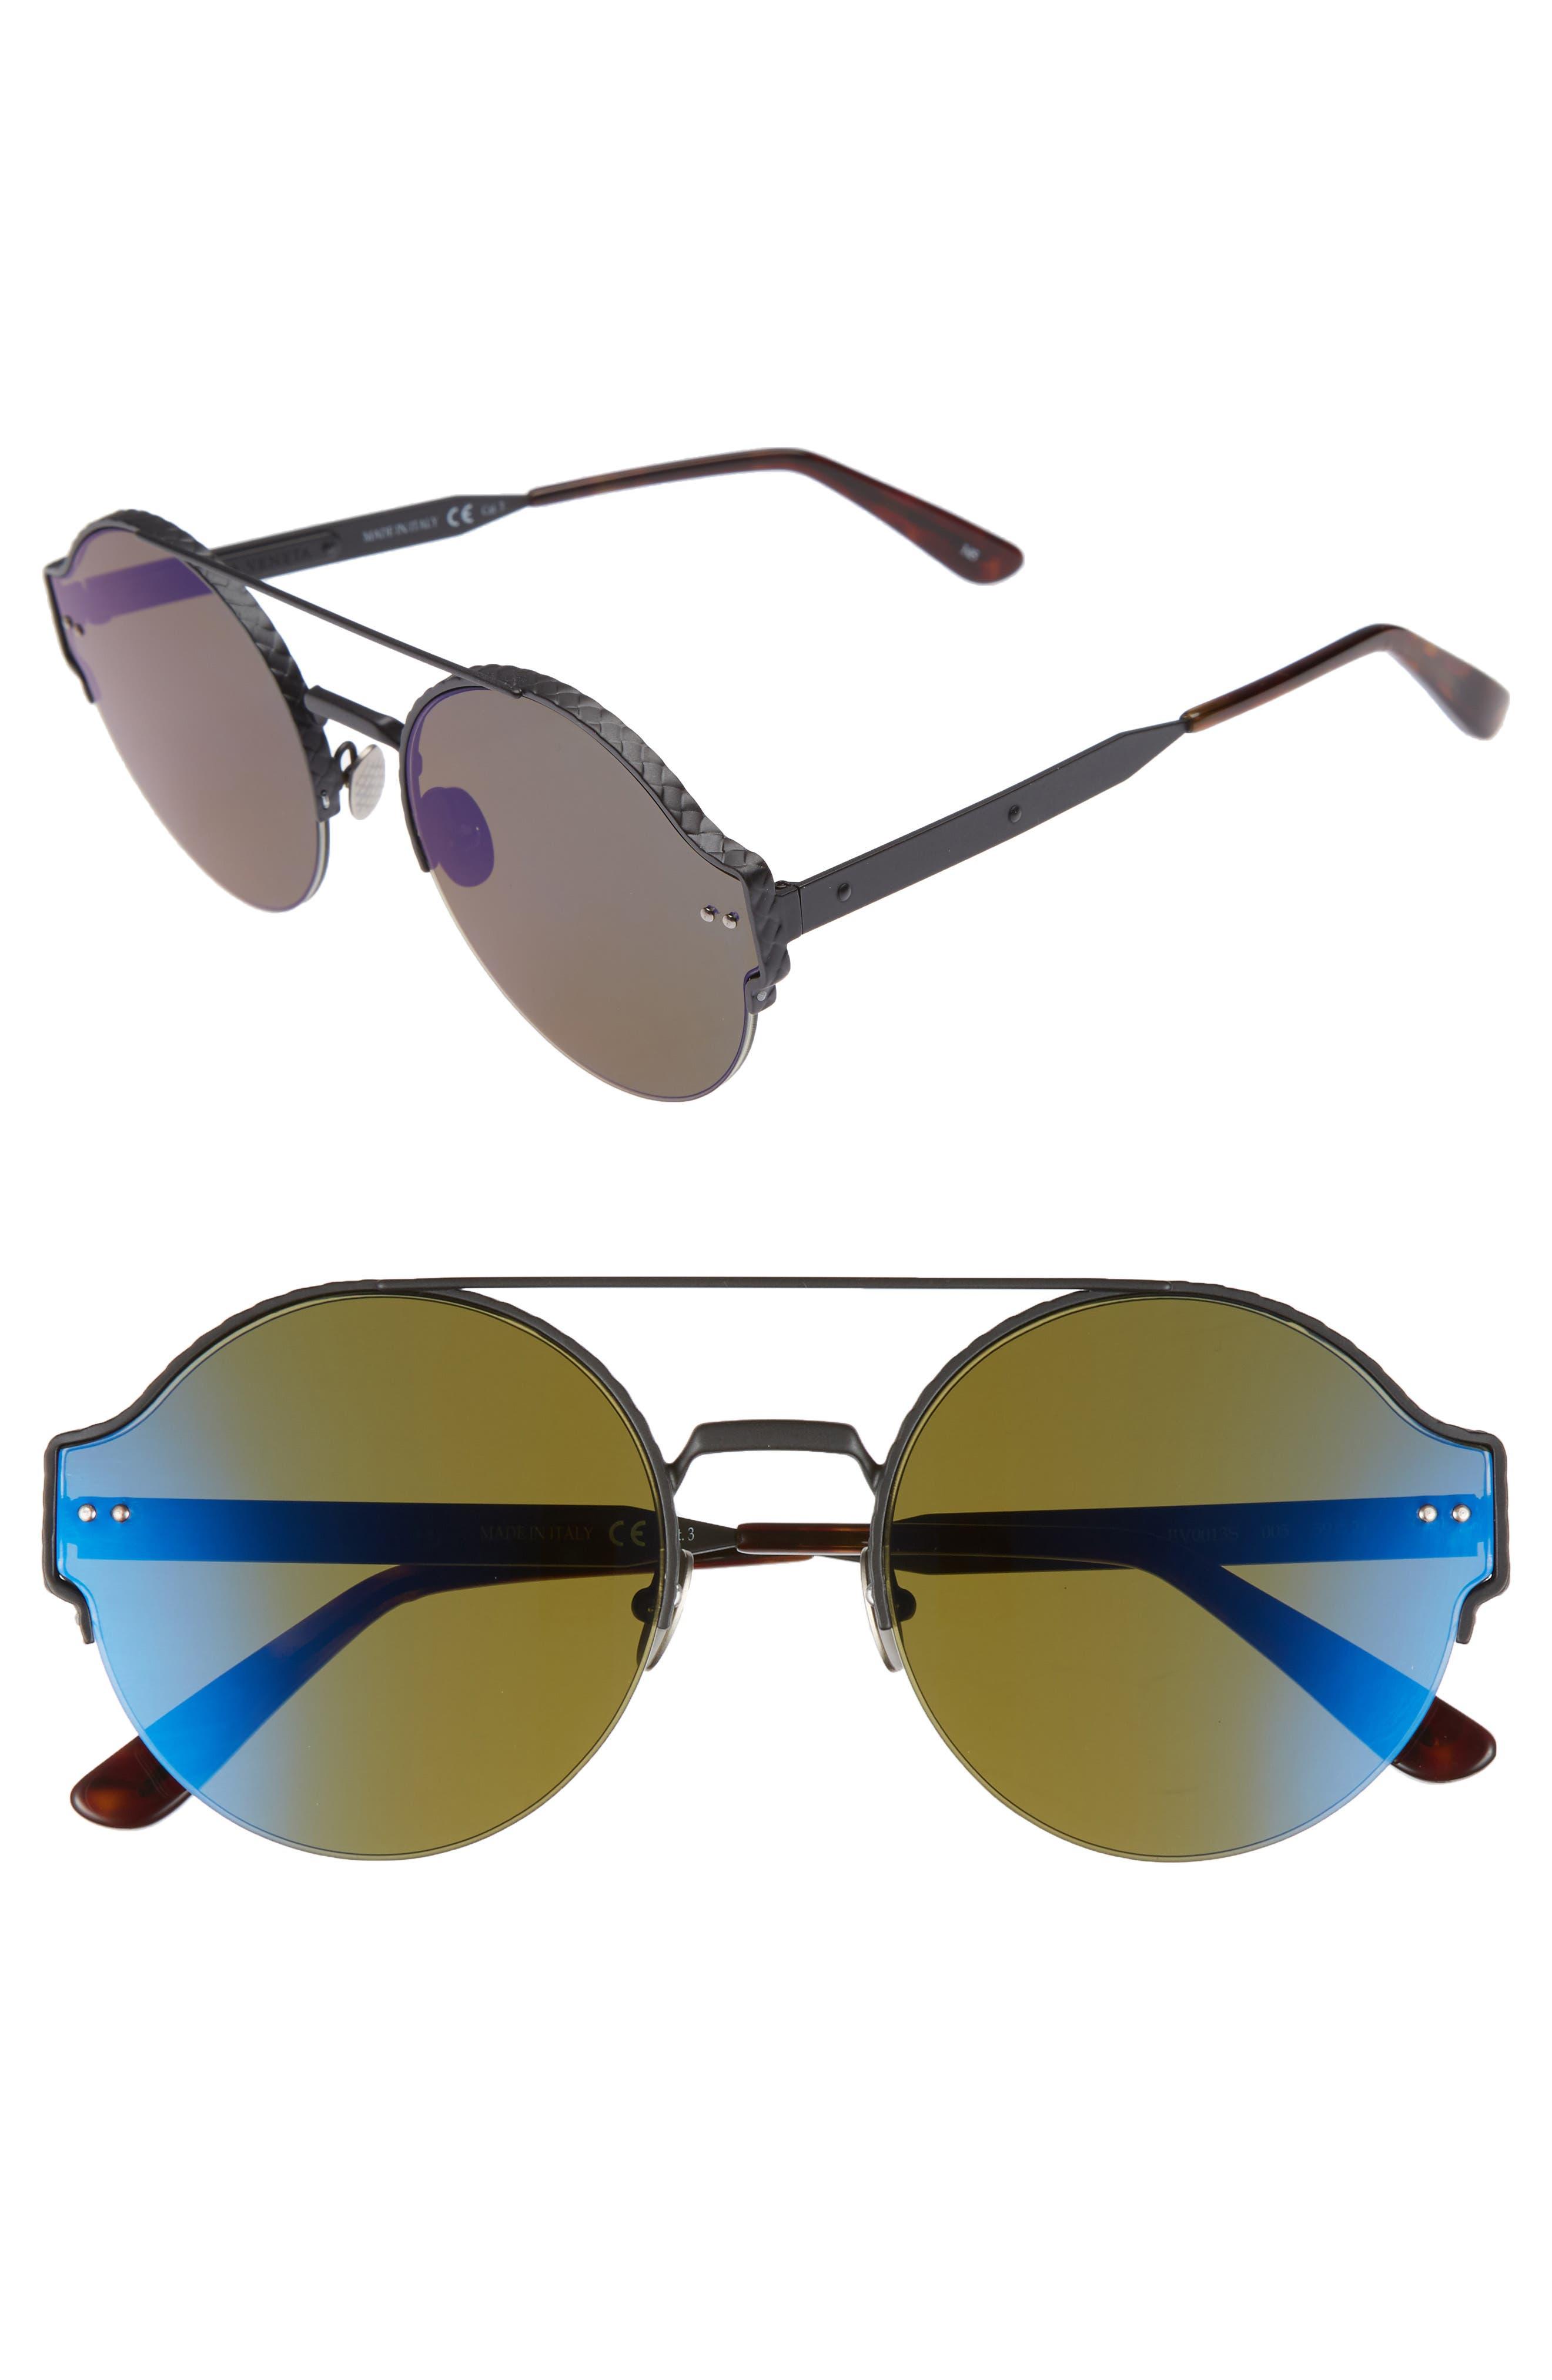 54mm Round Semi-Rimless Sunglasses,                             Main thumbnail 1, color,